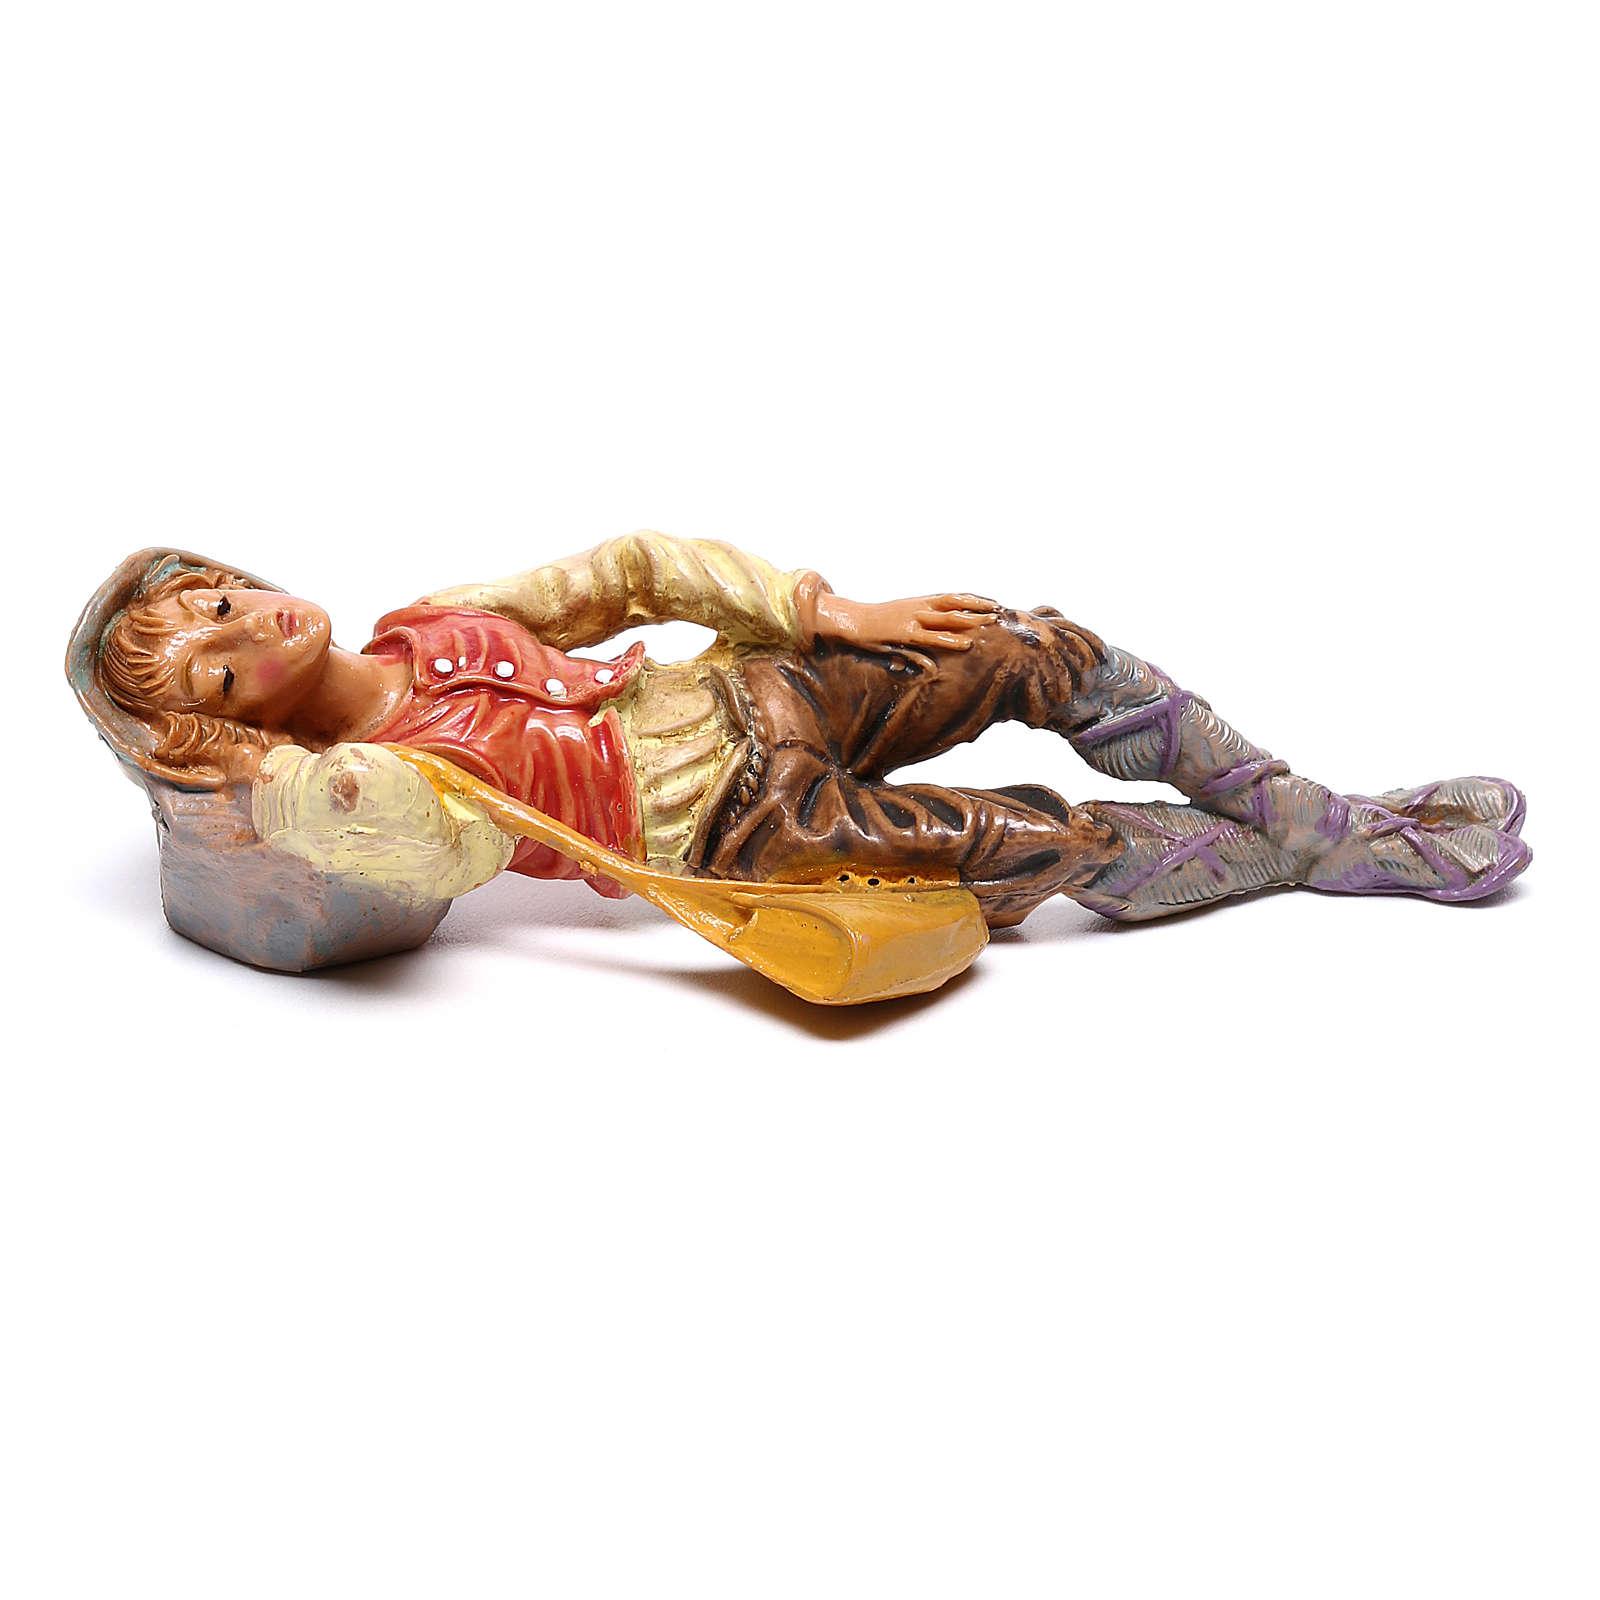 Pastore dormiente presepe Fontanini 10 cm 4